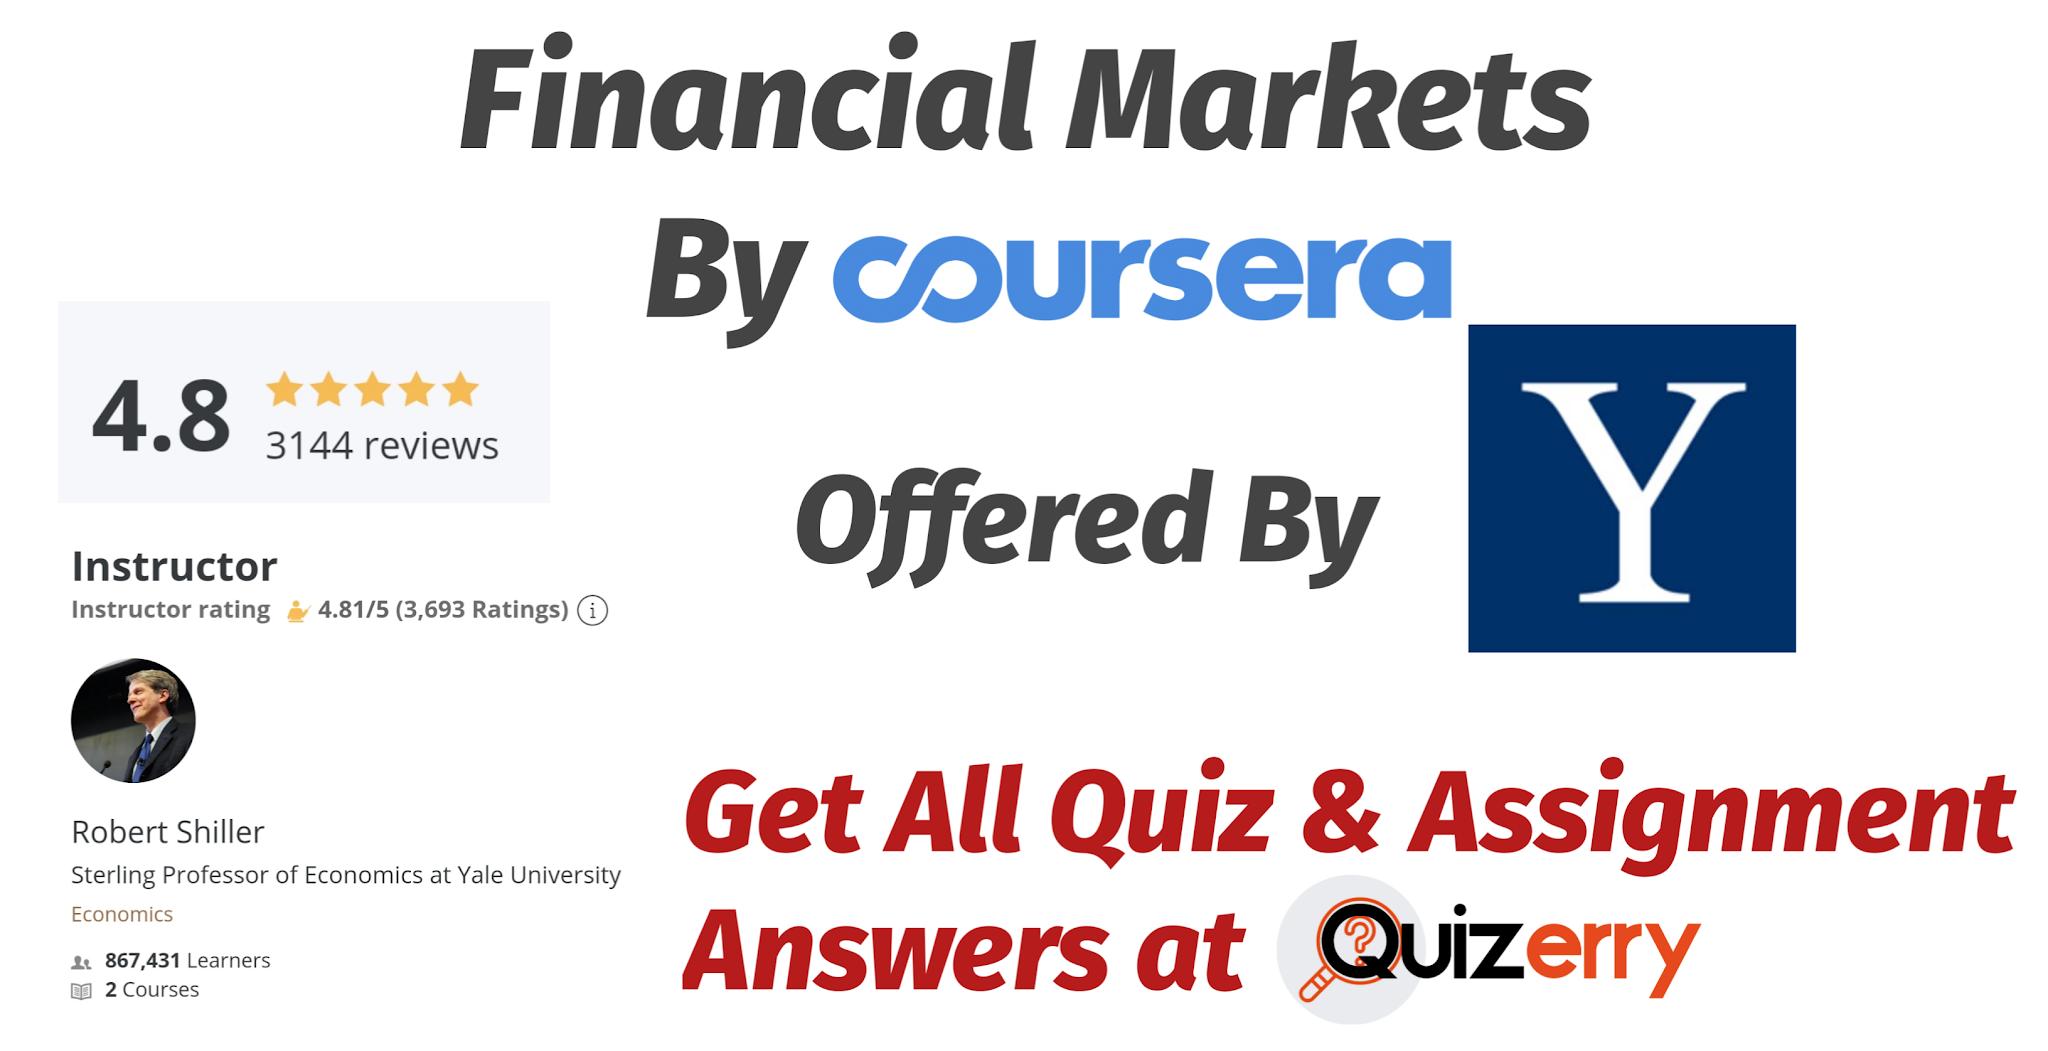 Financial Markets - Coursera Quiz Answers